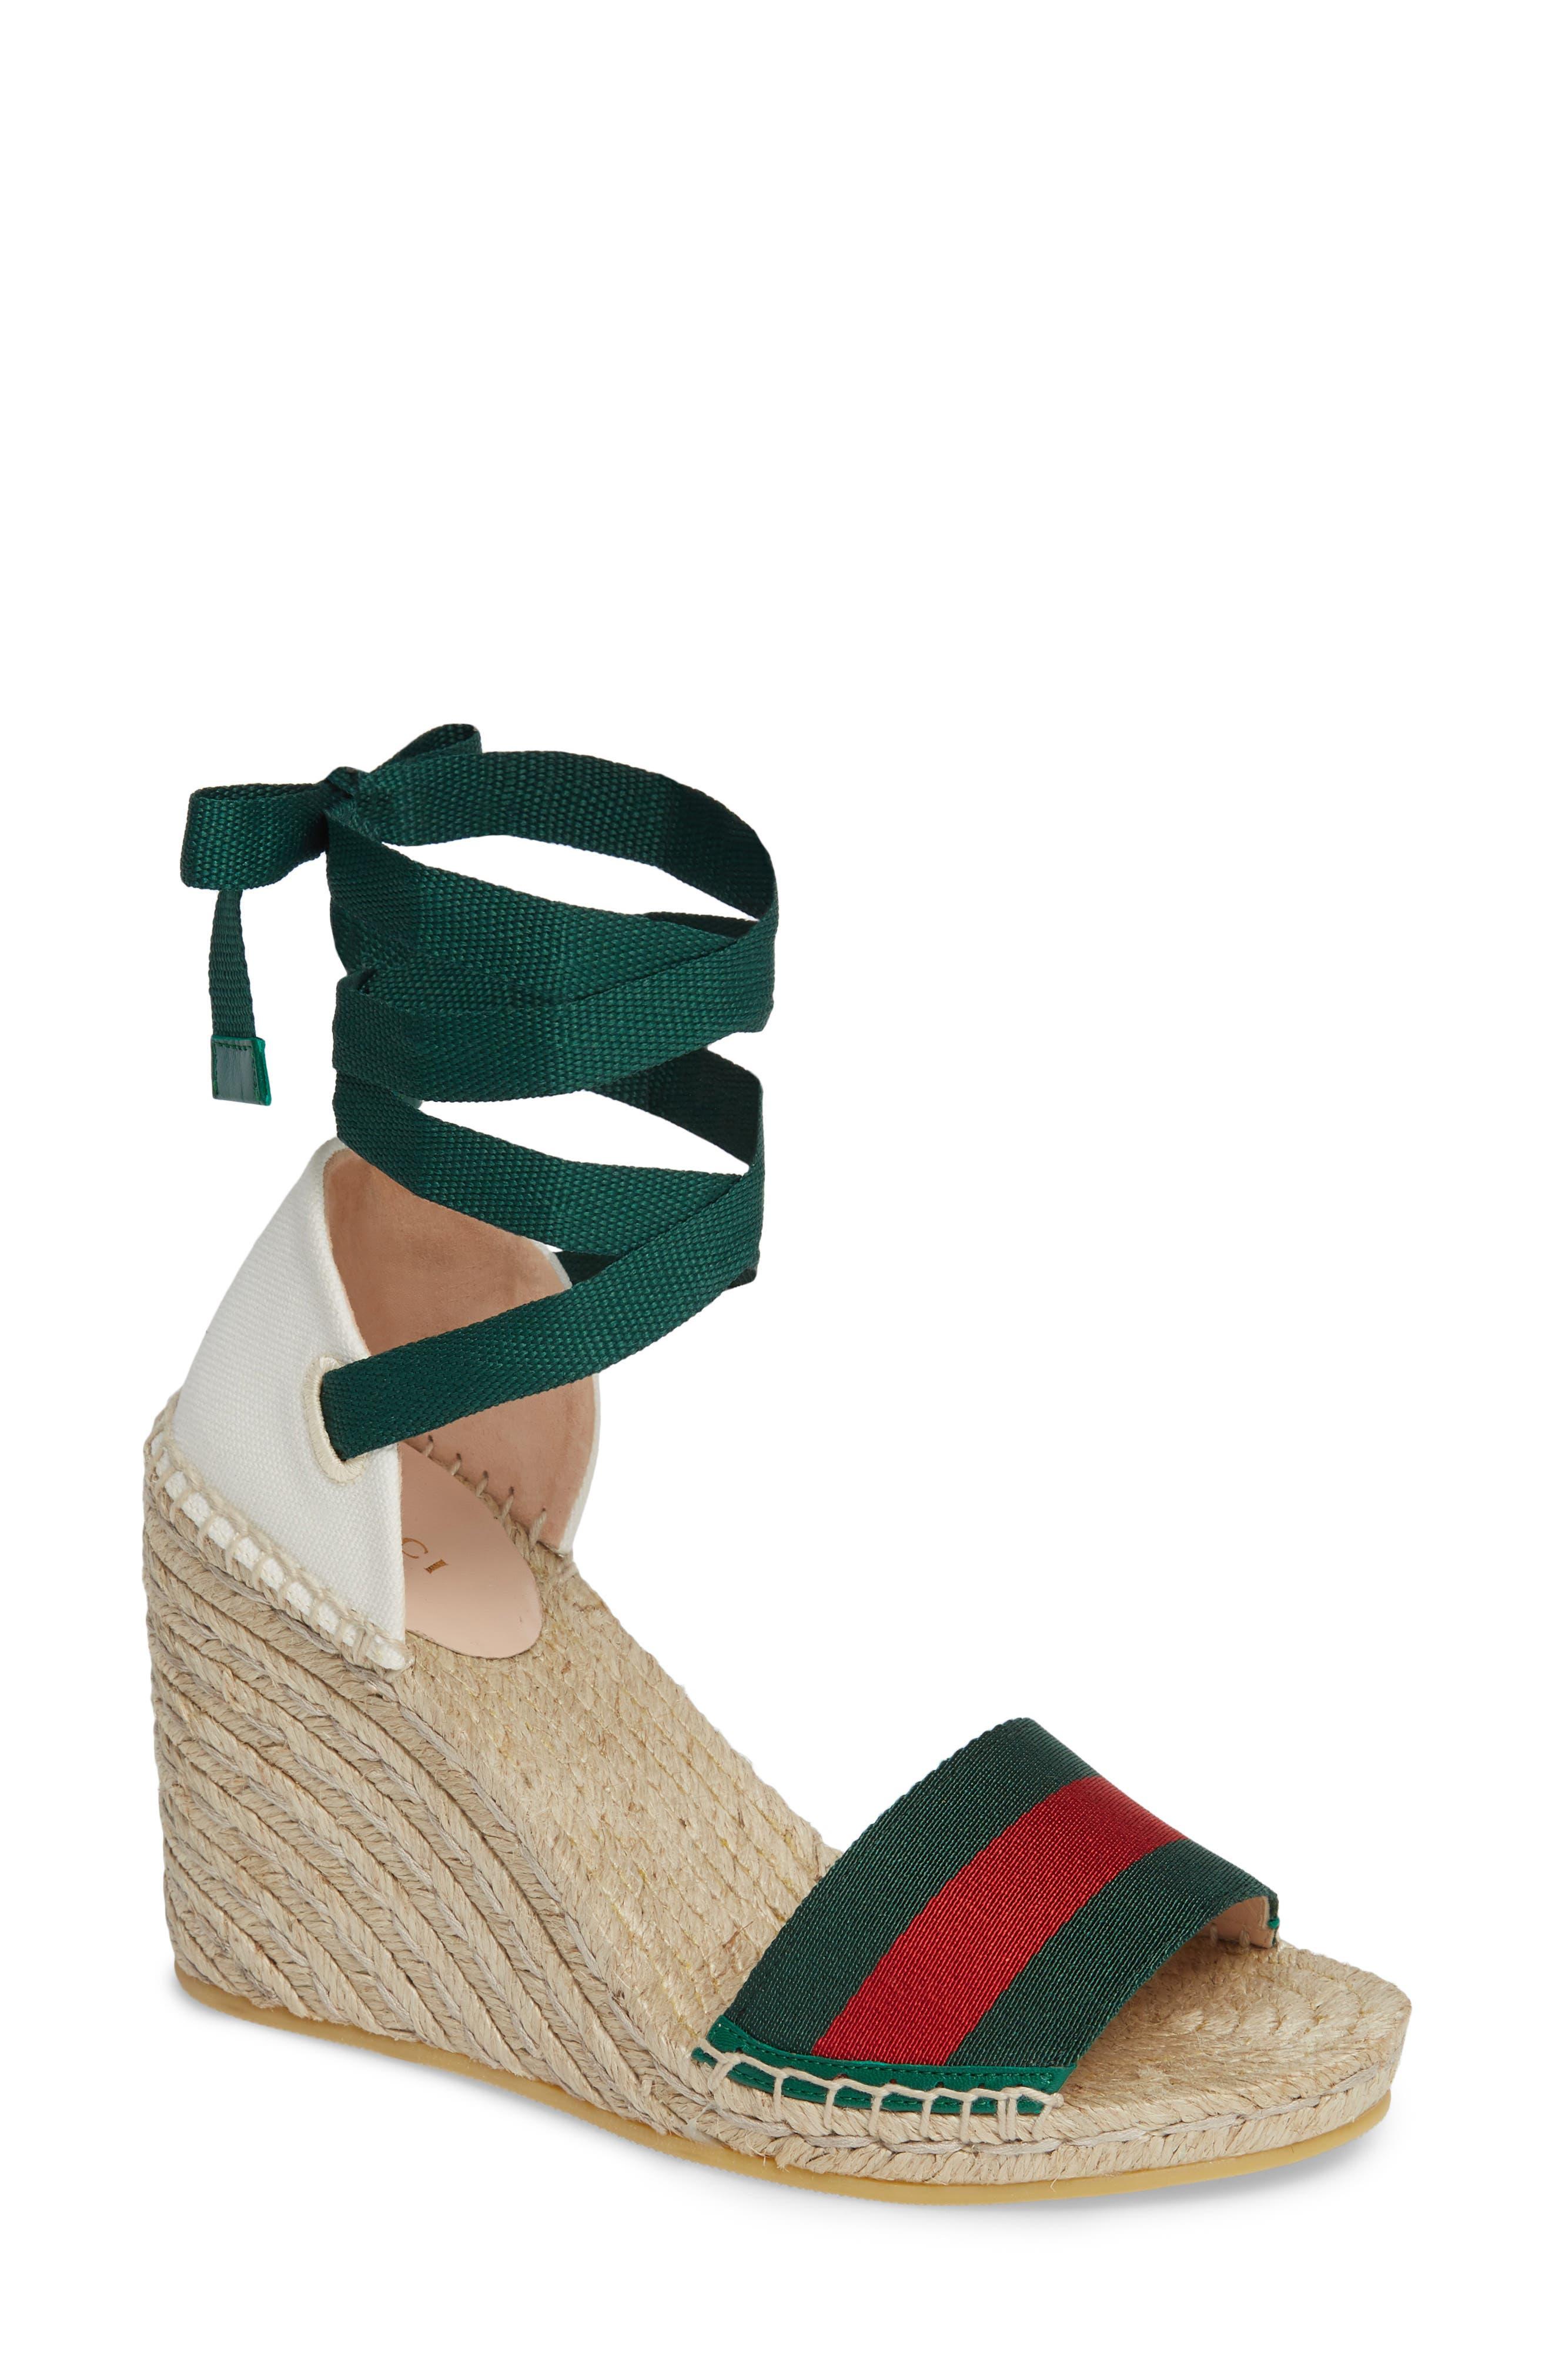 GUCCI Lilibeth Sylvie Web Espadrille Wedge Sandal, Main, color, WHITE/ GREEN